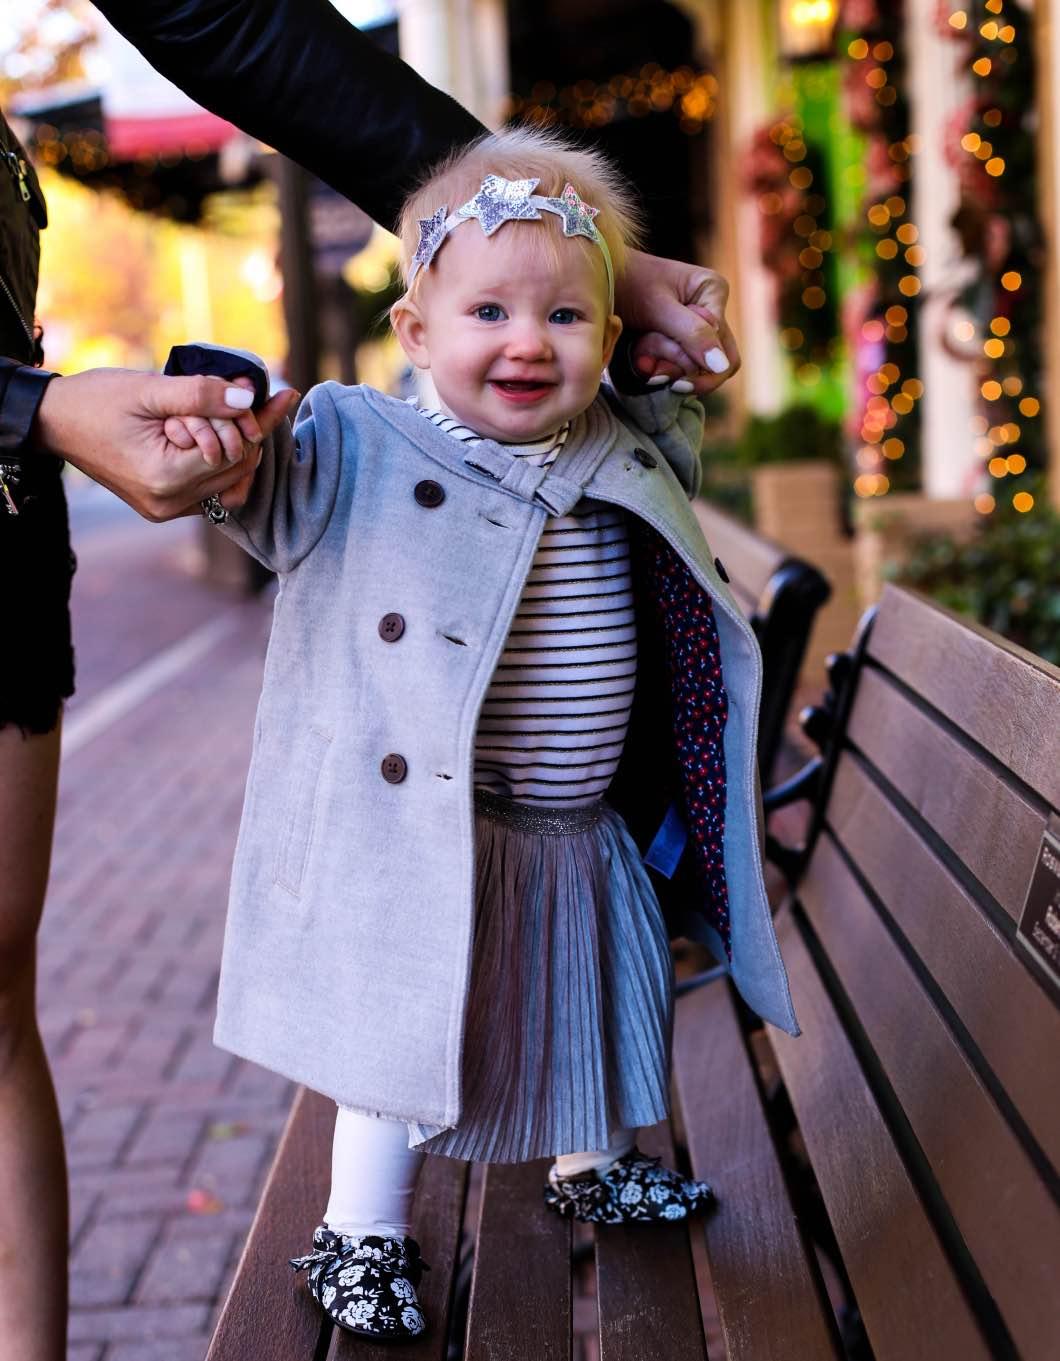 Baby Christmas Fashion OshKosh B'gosh - Baby and Toddler Holiday Outfits with OshKosh B'gosh by Atlanta style blogger Happily Hughes